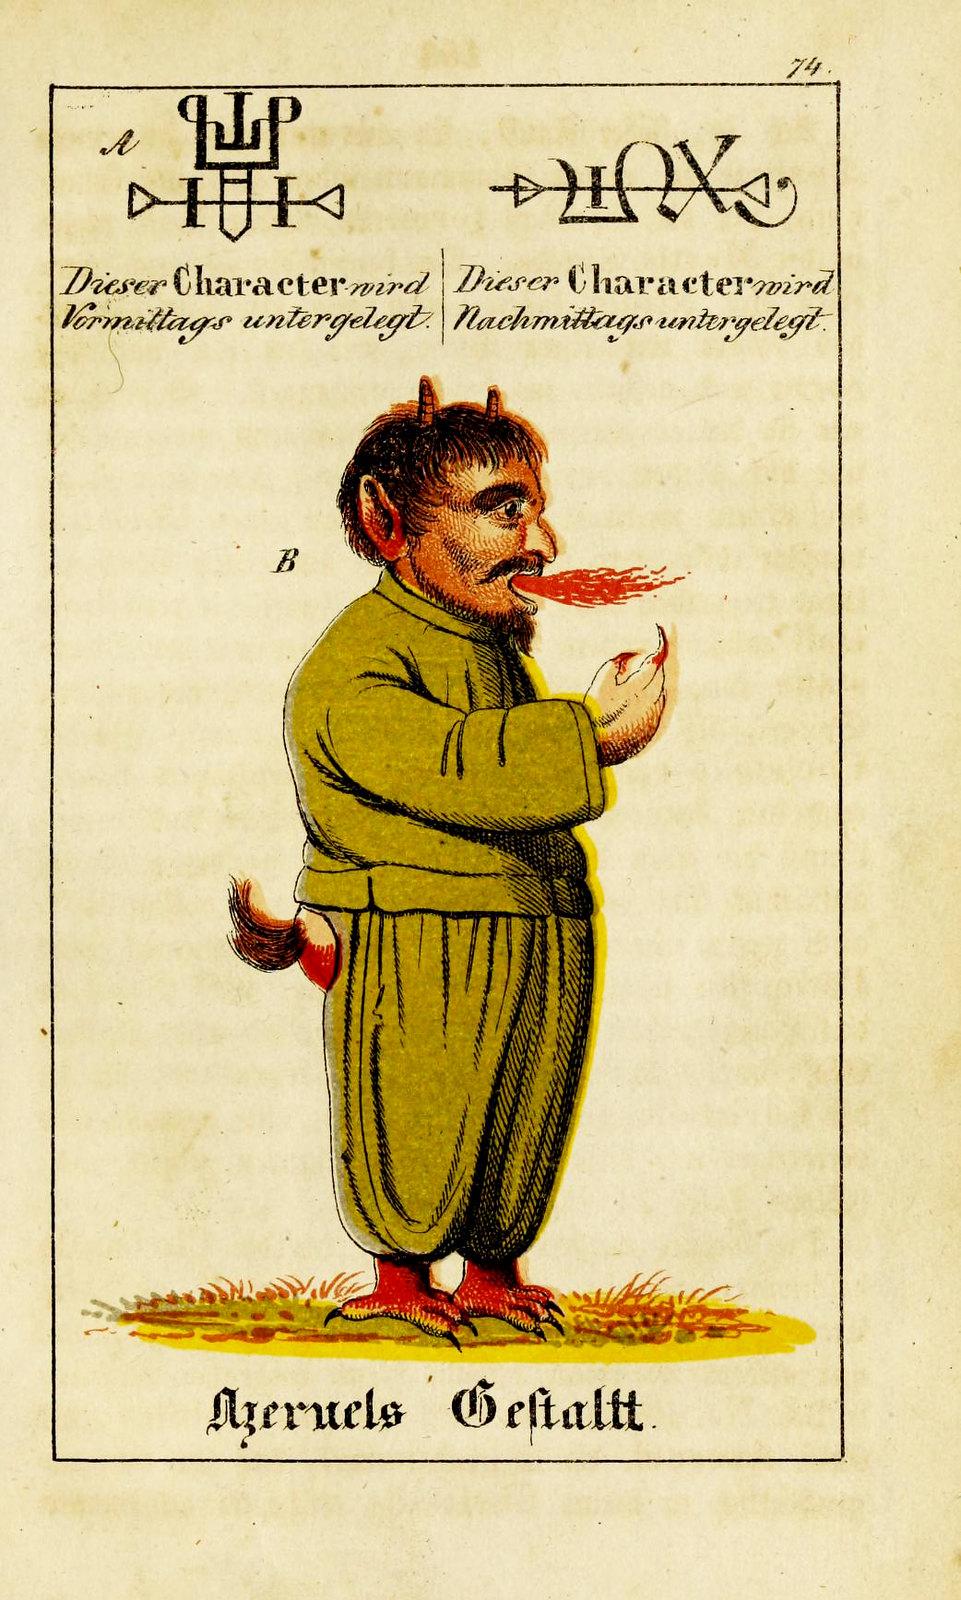 Johann Scheible - Doktor Johannes Faust's Magia naturalis et innaturalis, 1849 (19)